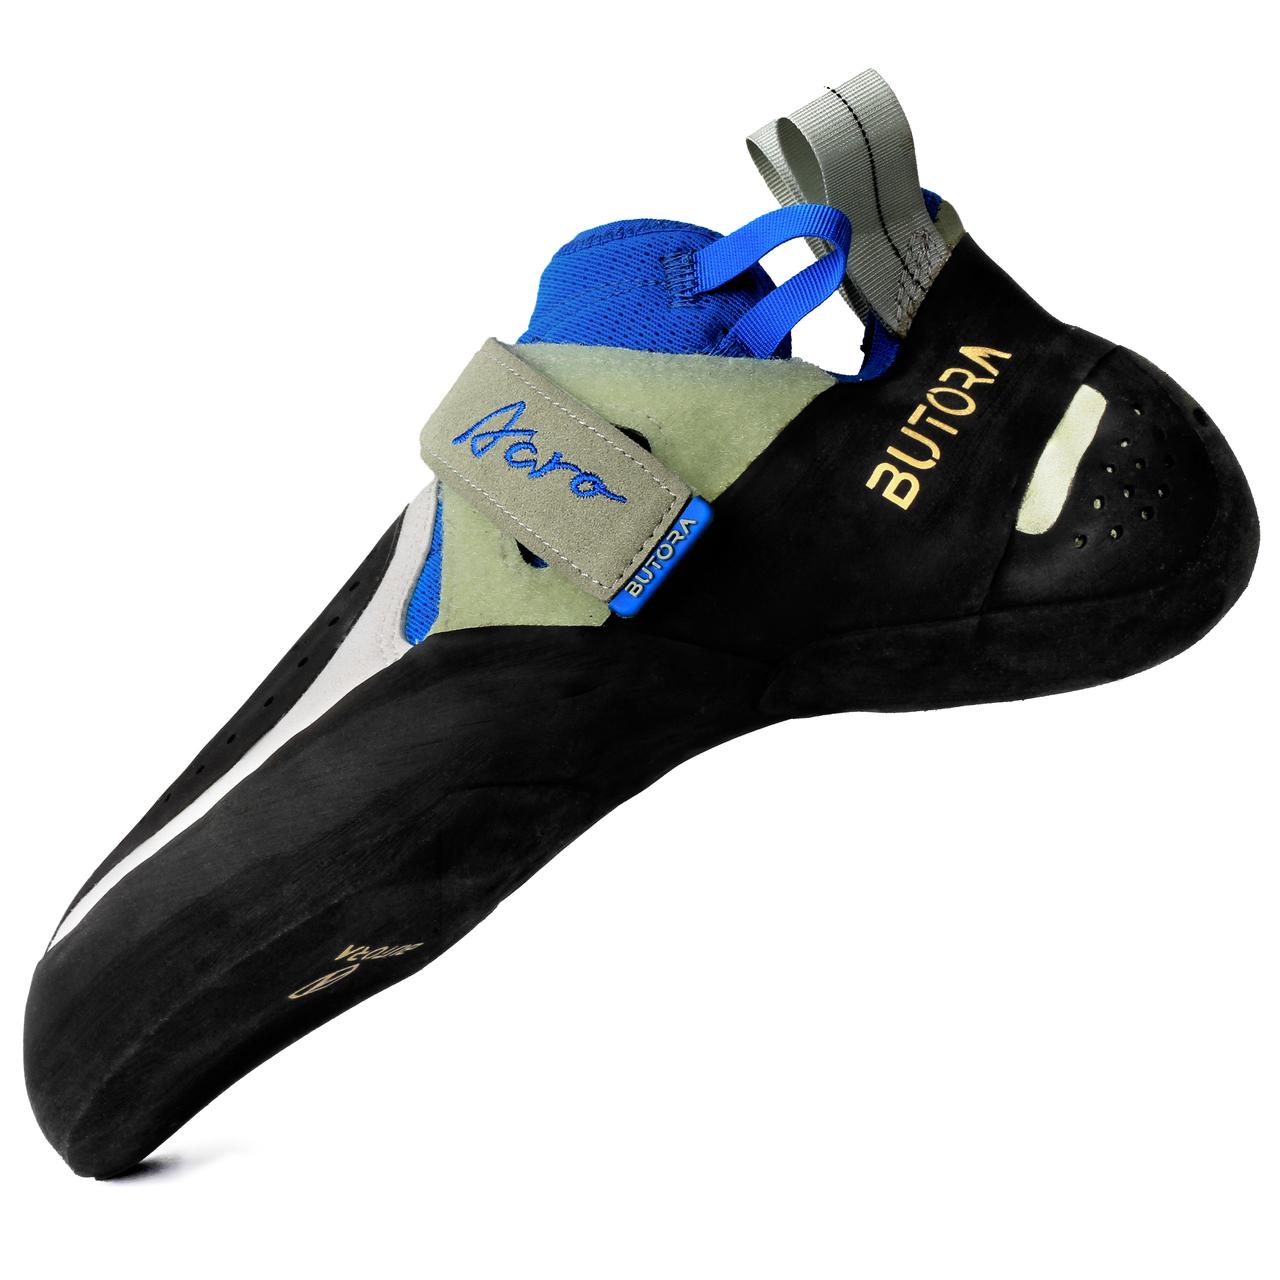 Acro Blue - Narrow Fit